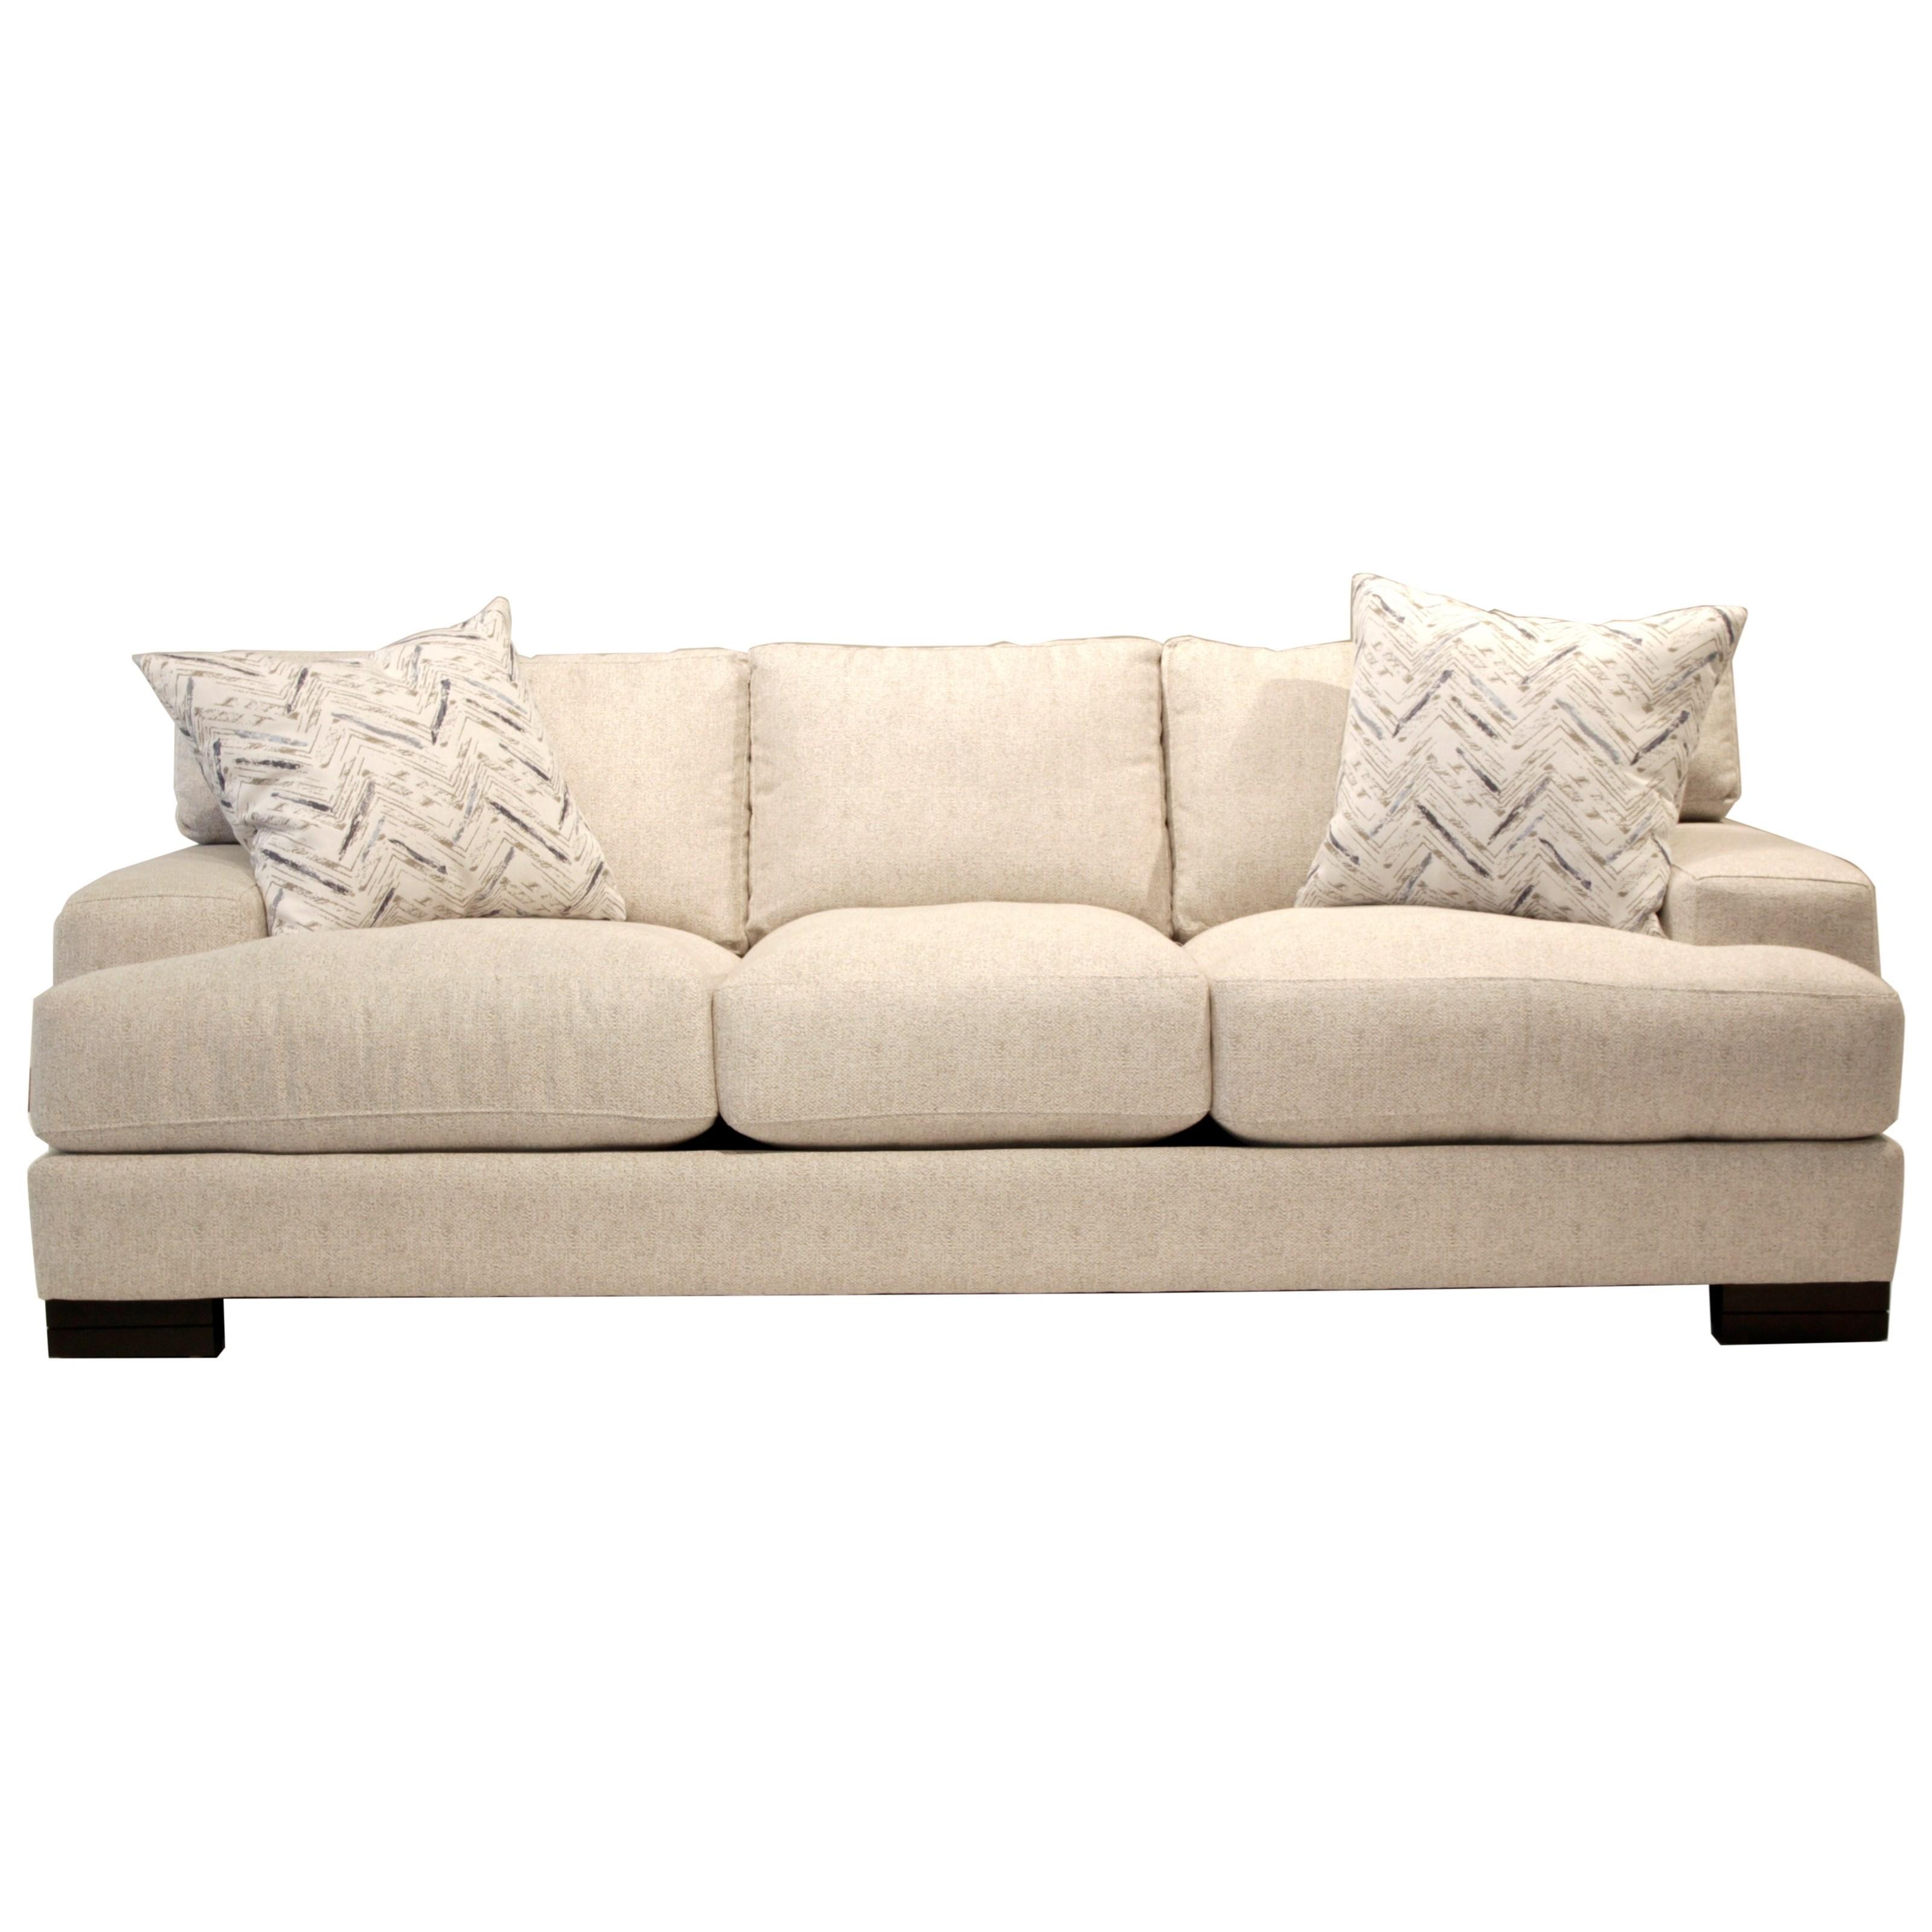 Sofa Outlet Flint Divano Classico Pelle Mascheroni Poltrona